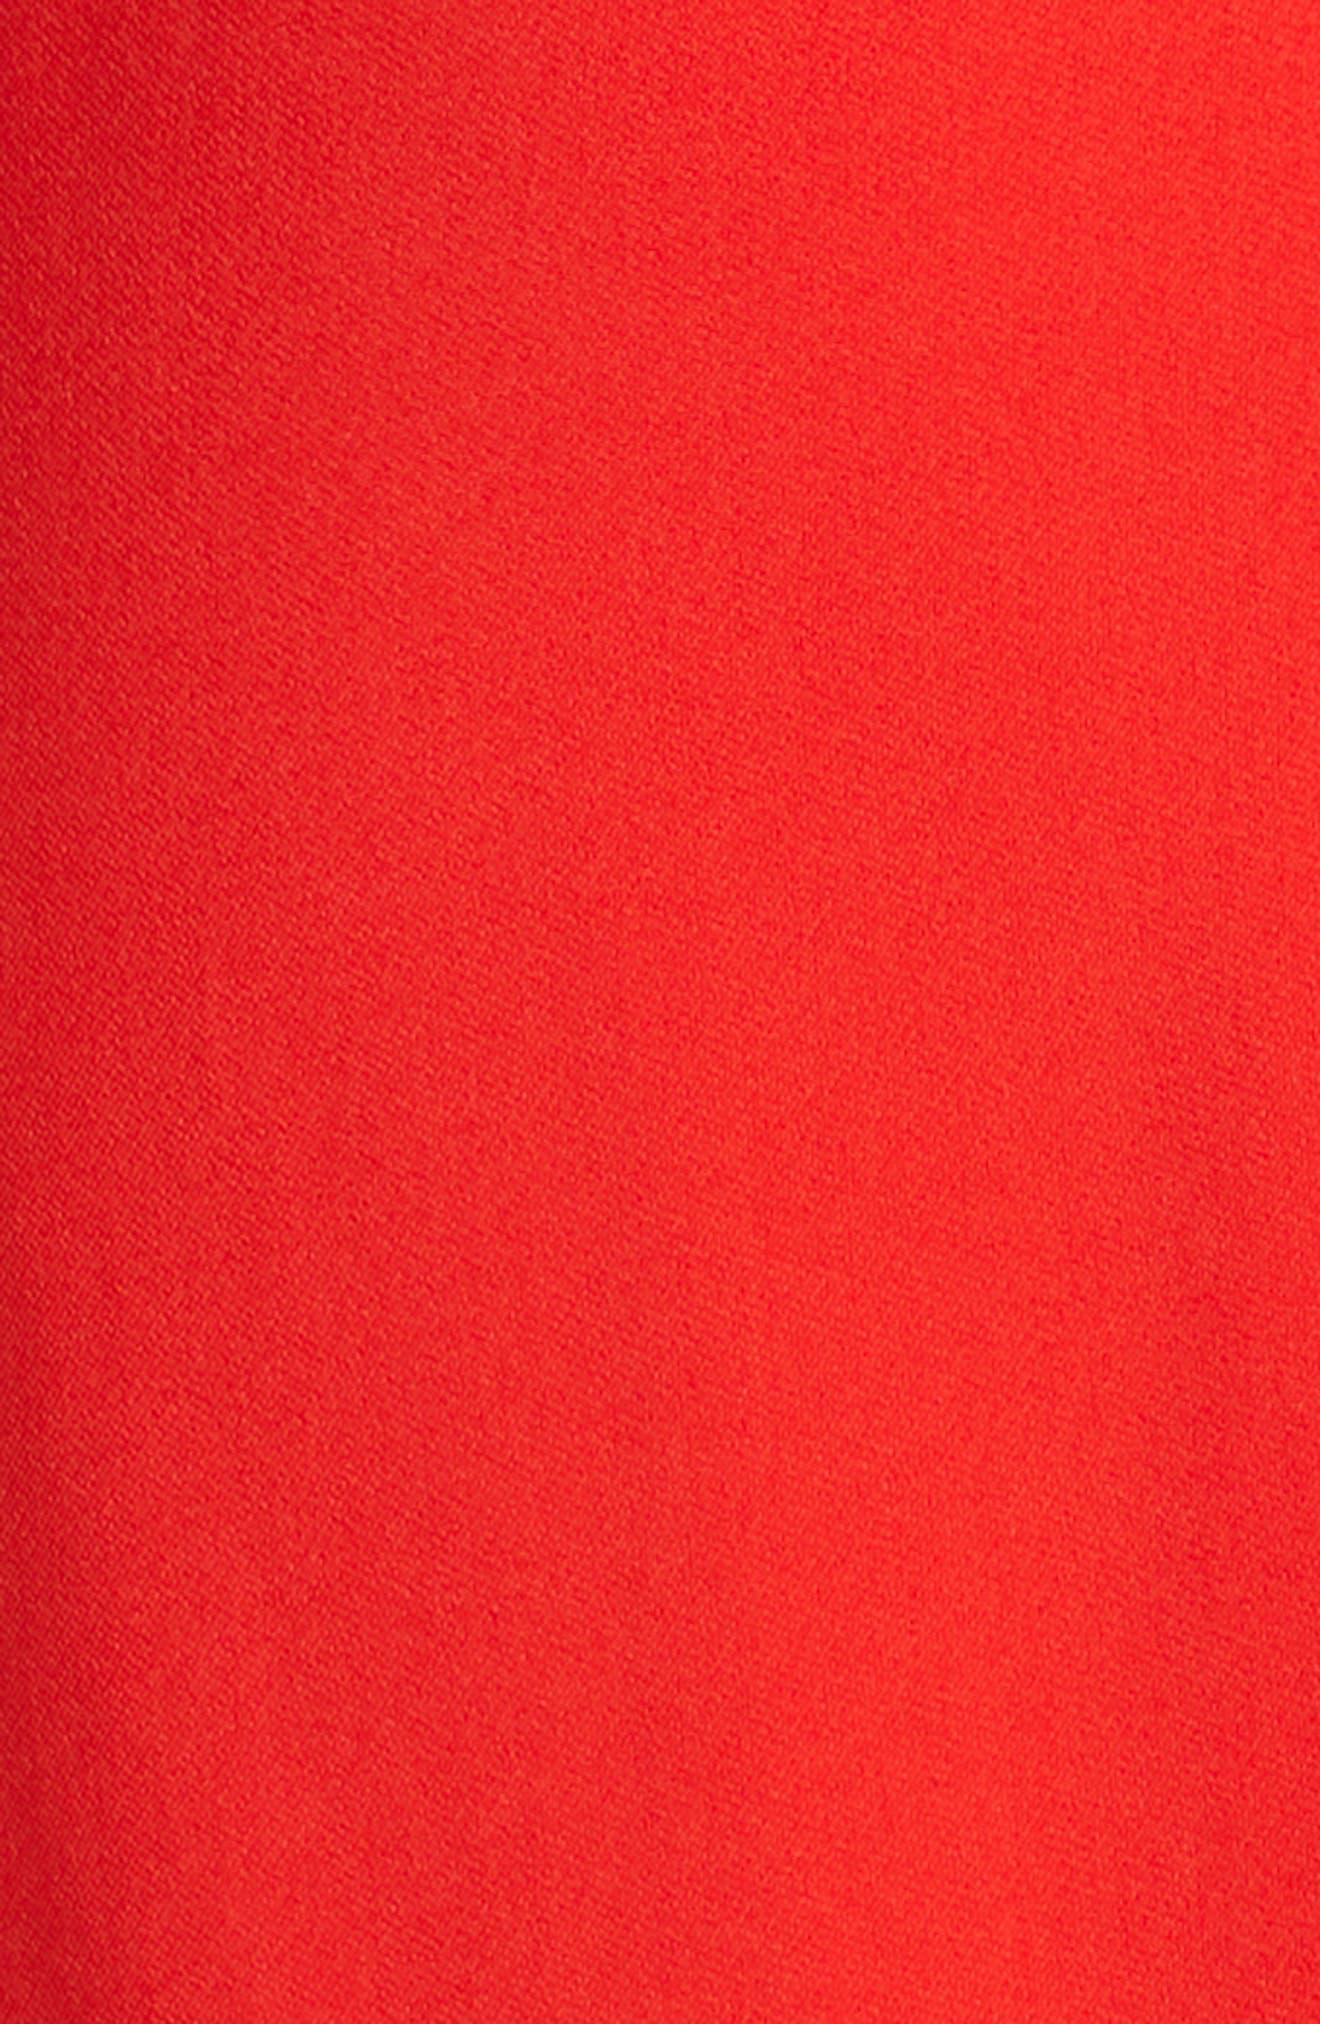 Ruby Cutout Sheath Gown,                             Alternate thumbnail 5, color,                             SCARLET